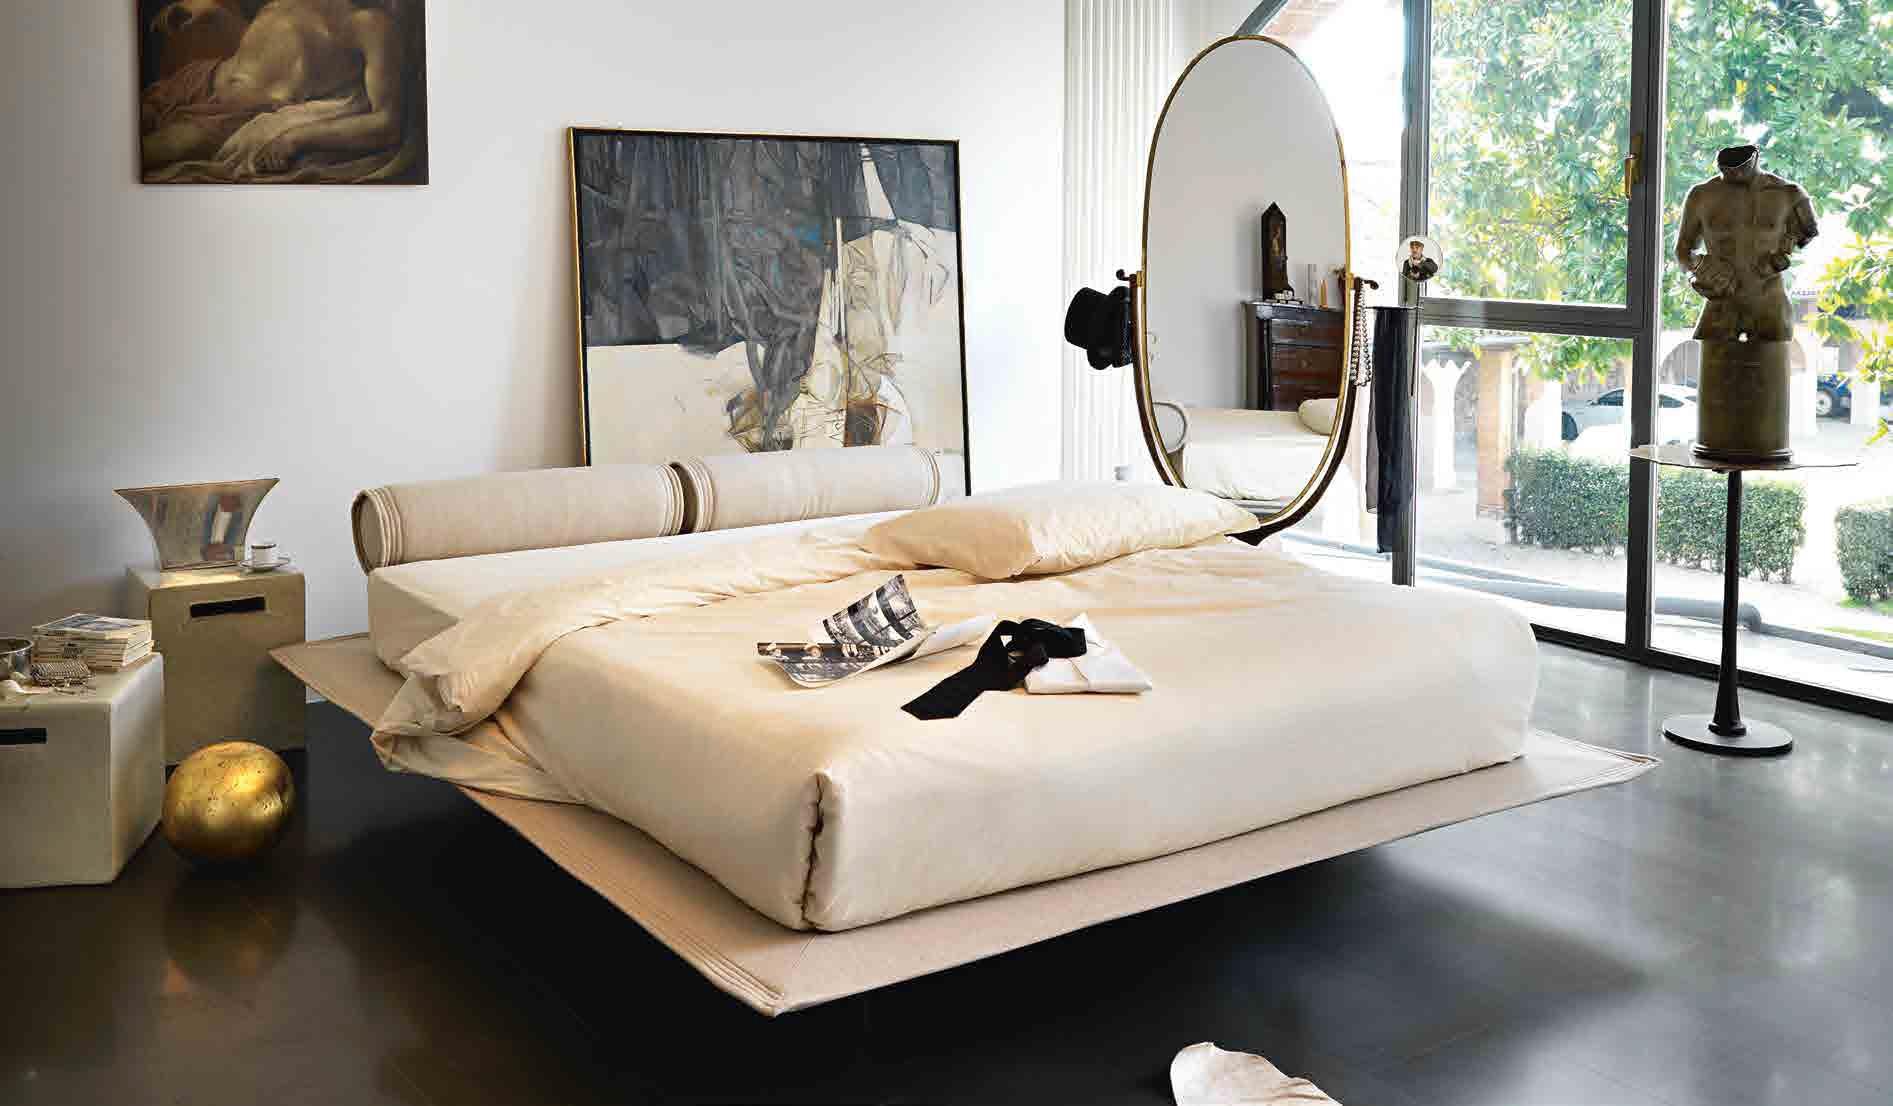 cabeceros-tapizados-general-muebles-paco-caballero-1811-5cdfdff846217